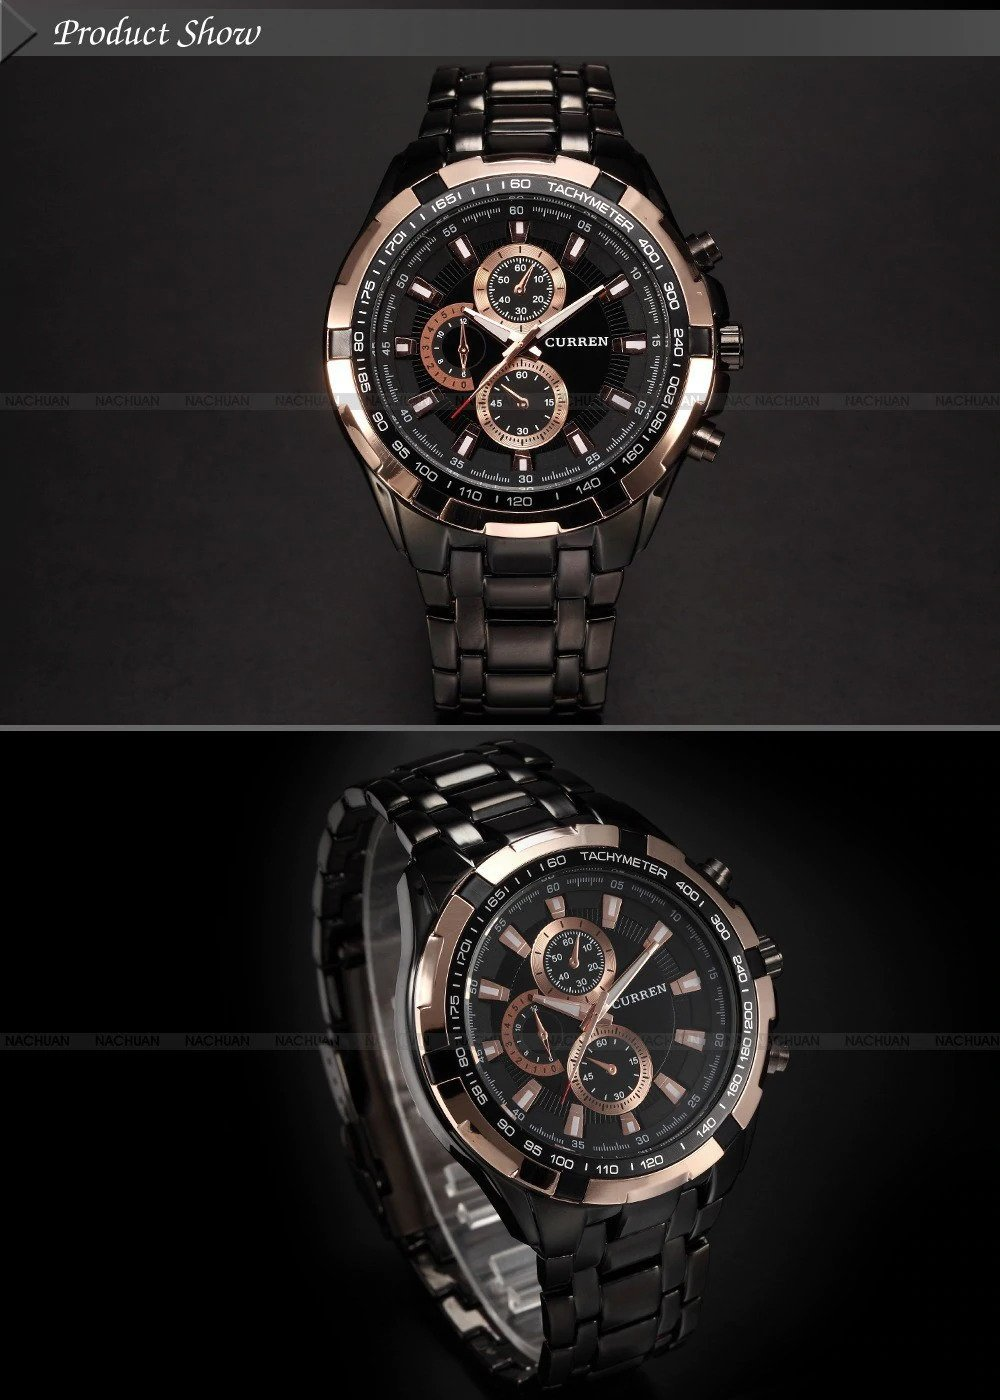 Zegarek Curren Harrison czarny złoty 6